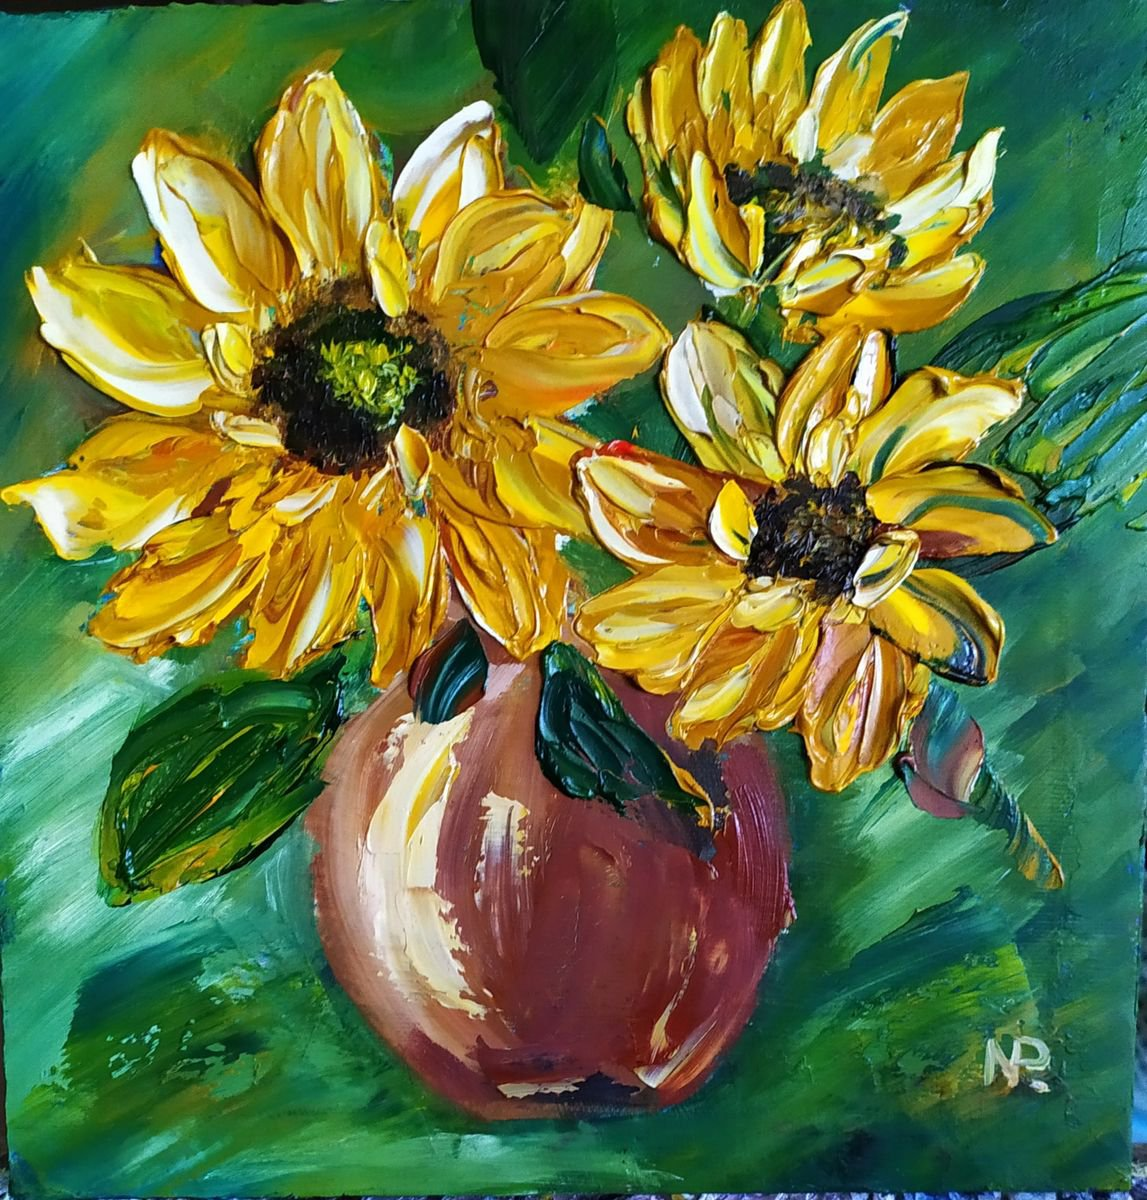 Sunflowers inspired by Van Gogh, original floral | Artfinder